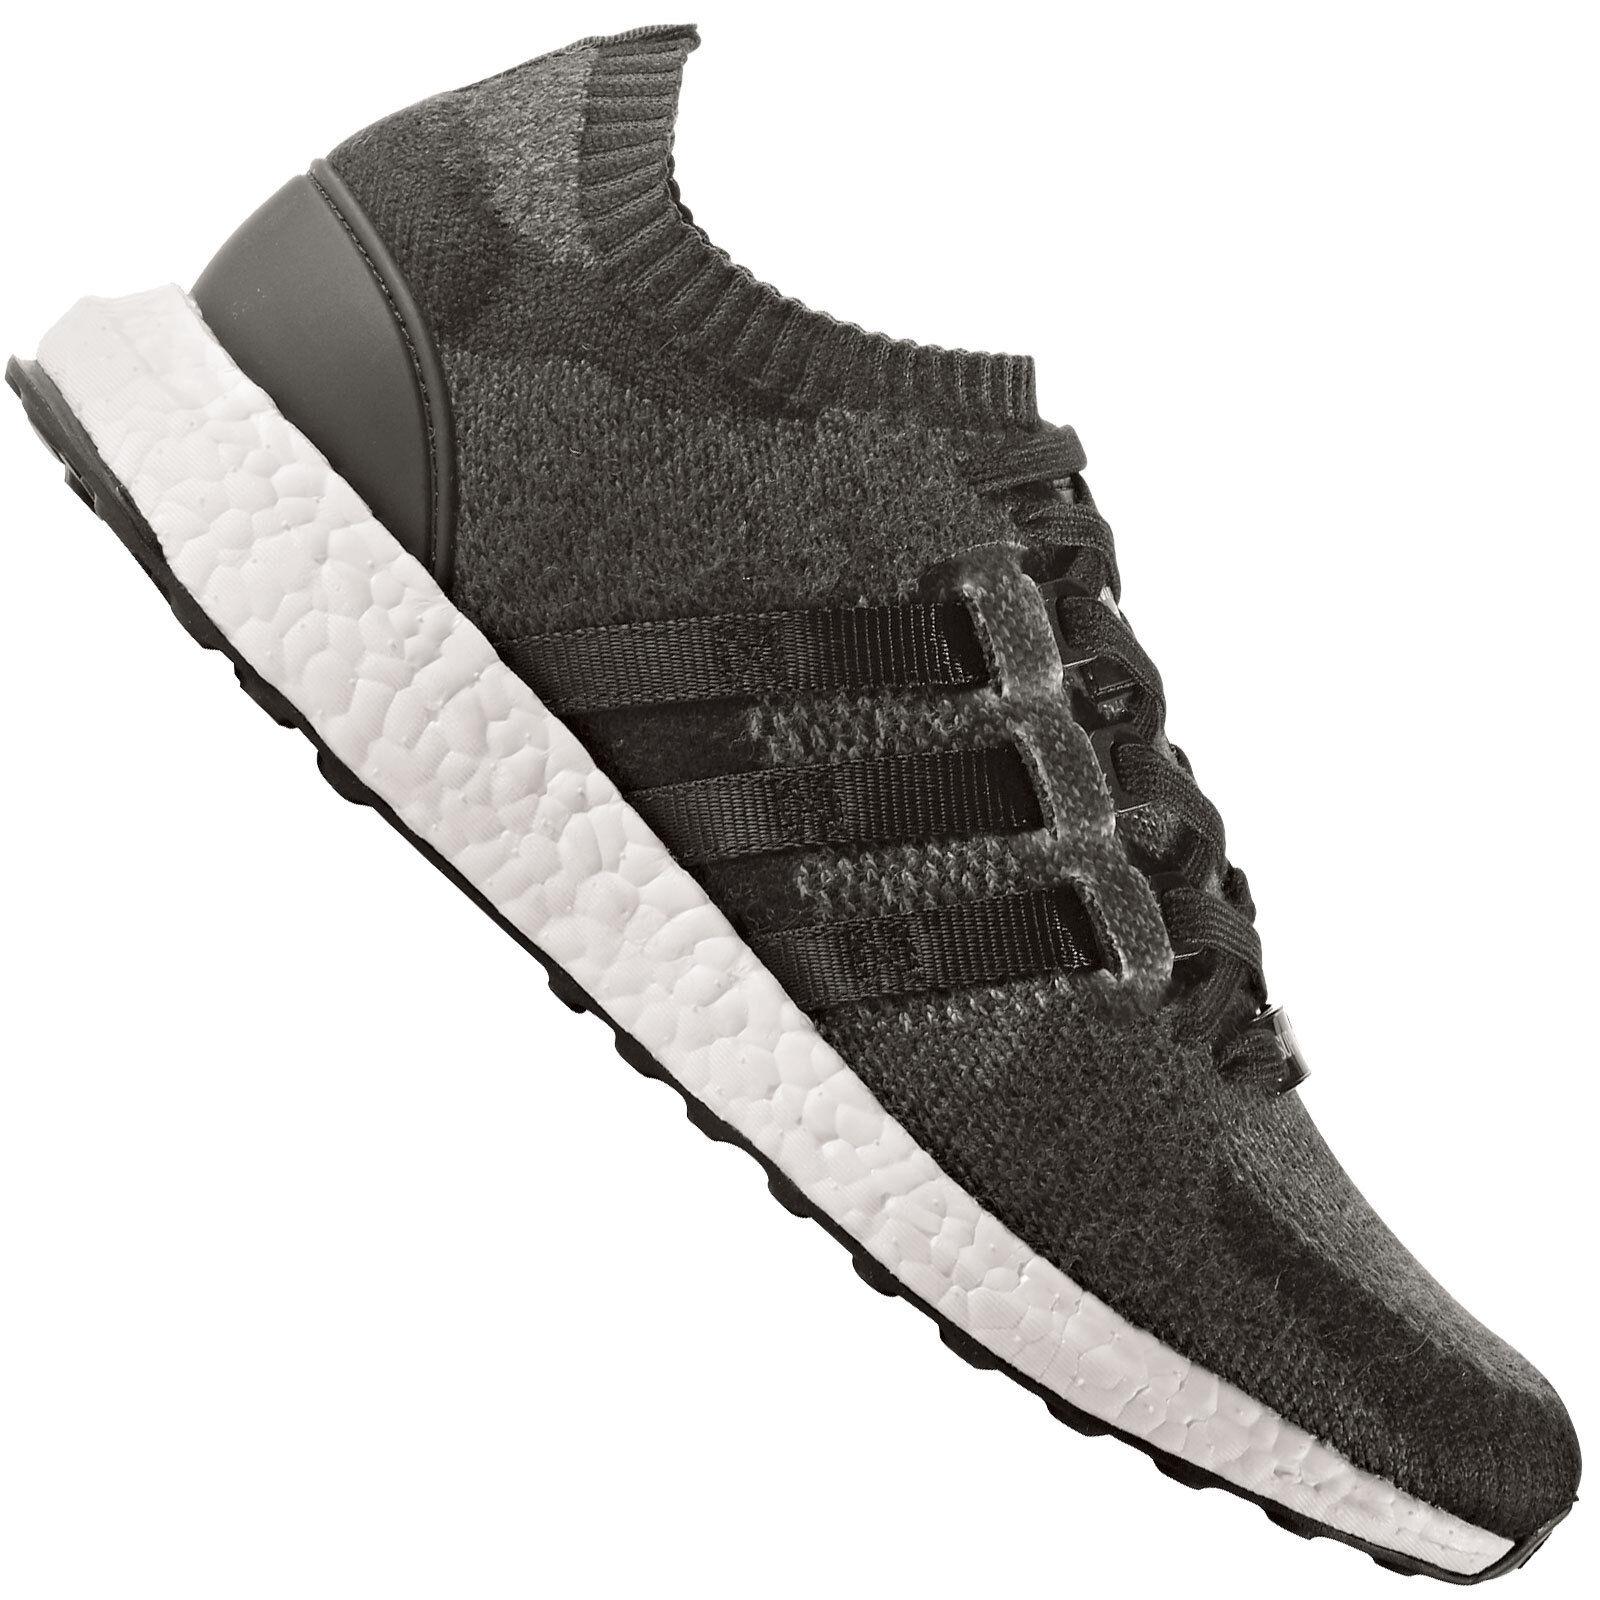 adidas Originals Equipment Support Ultra Primeknit EQT PK Boost Sneaker Schuhe